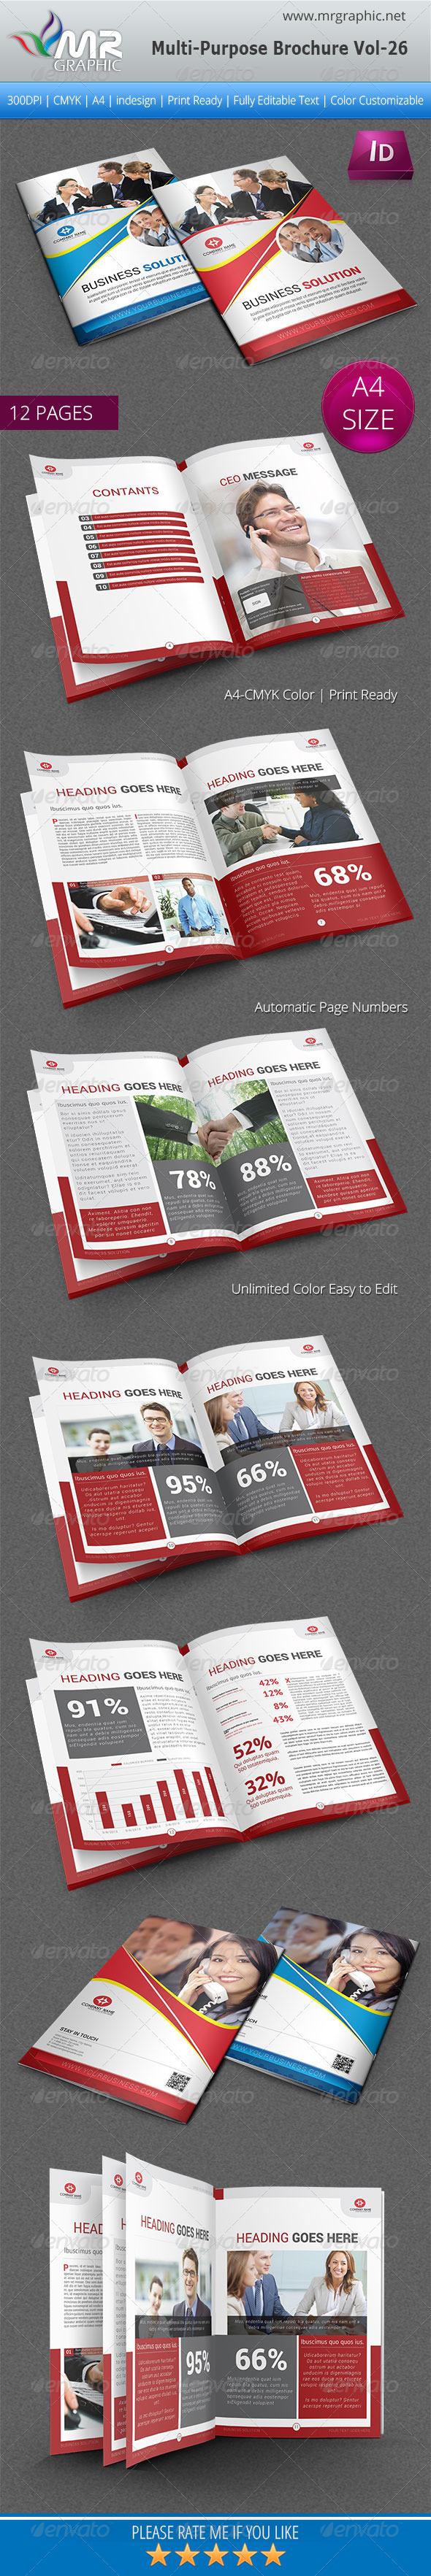 Multipurpose Business Brochure Template Vol-26 - Corporate Brochures